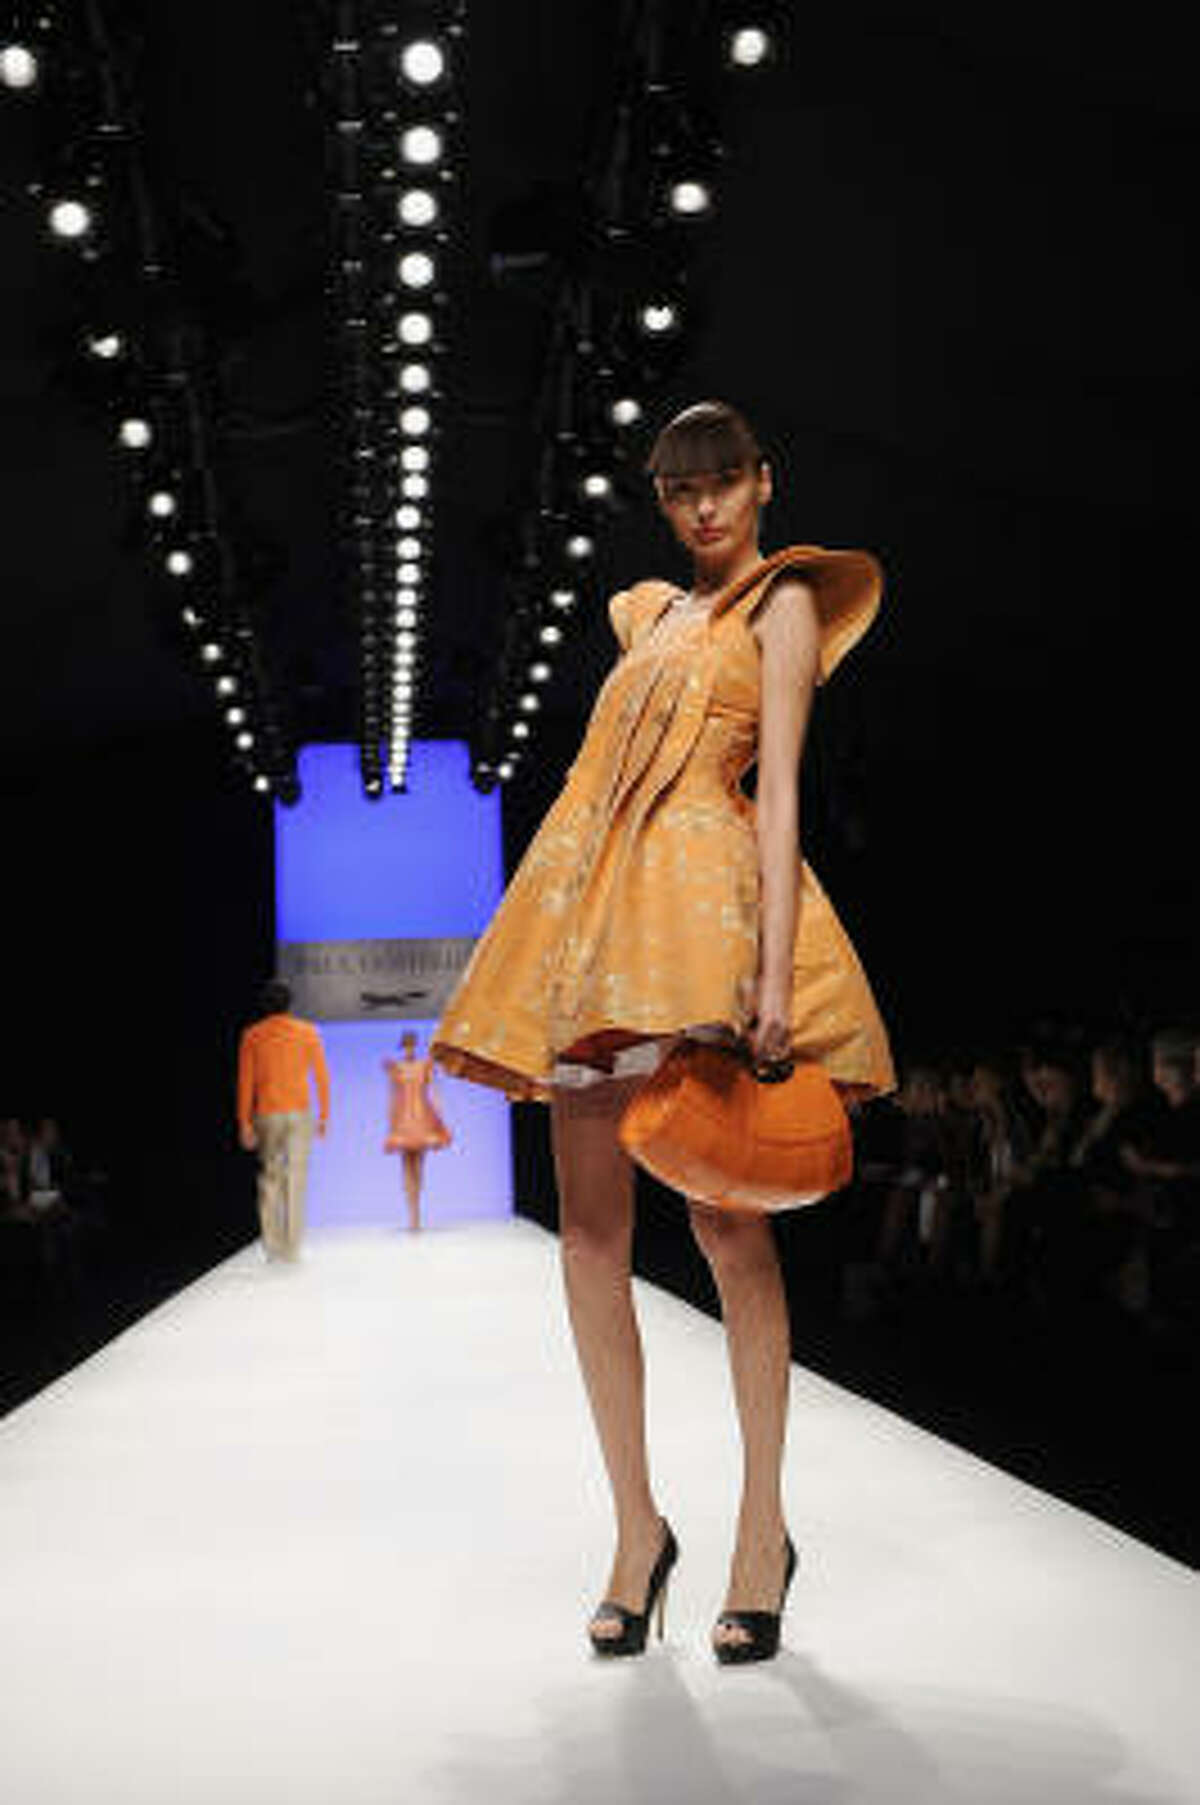 A model walks the catwalk during the Paul Costelloe fashion show. London's fashion week runs Sept. 18-23.